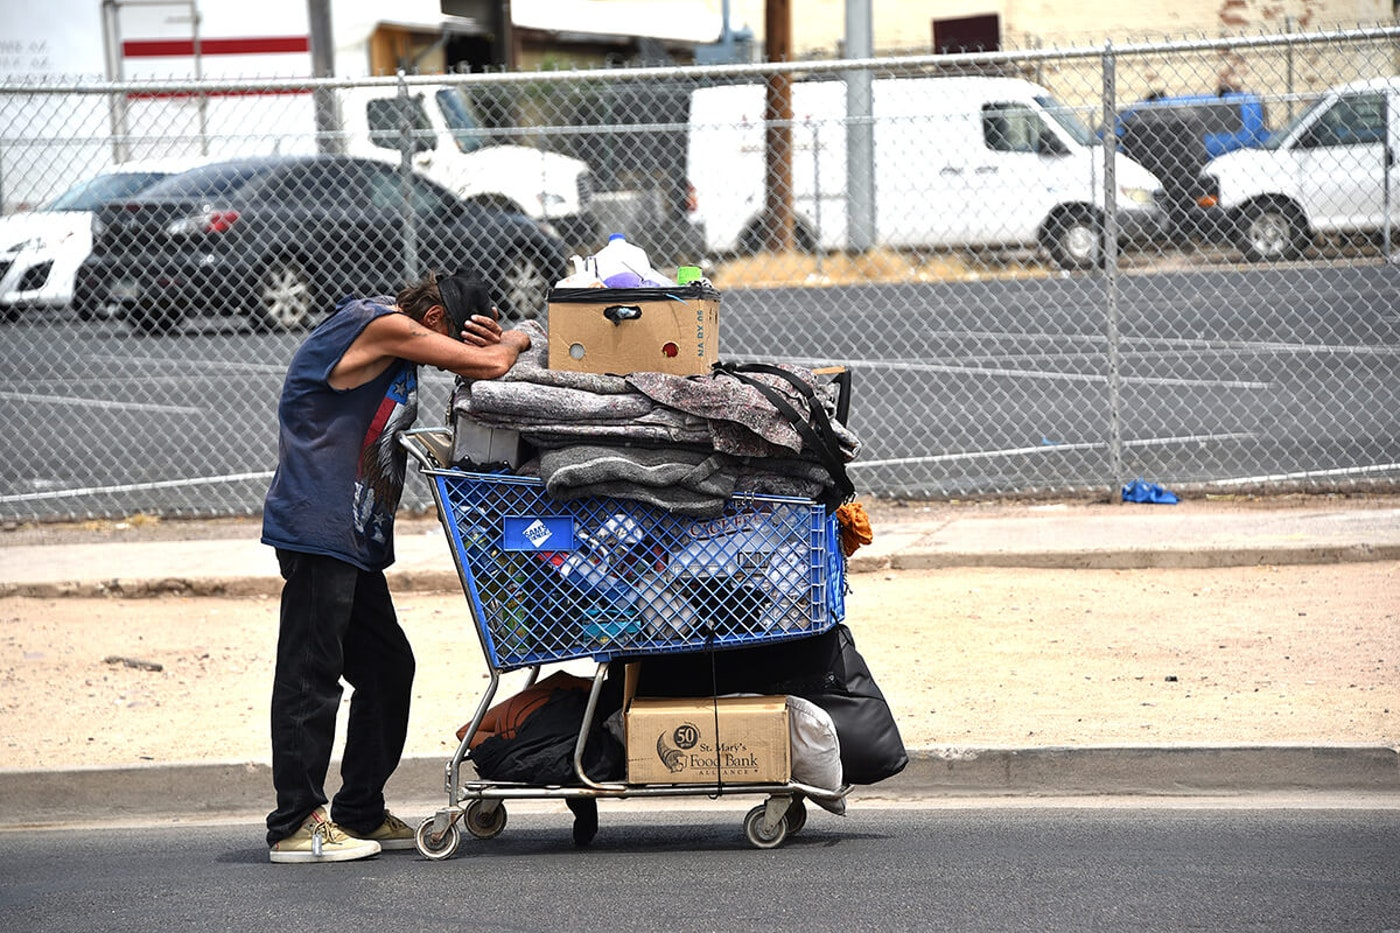 homeless man leaning on shopping cart full of items